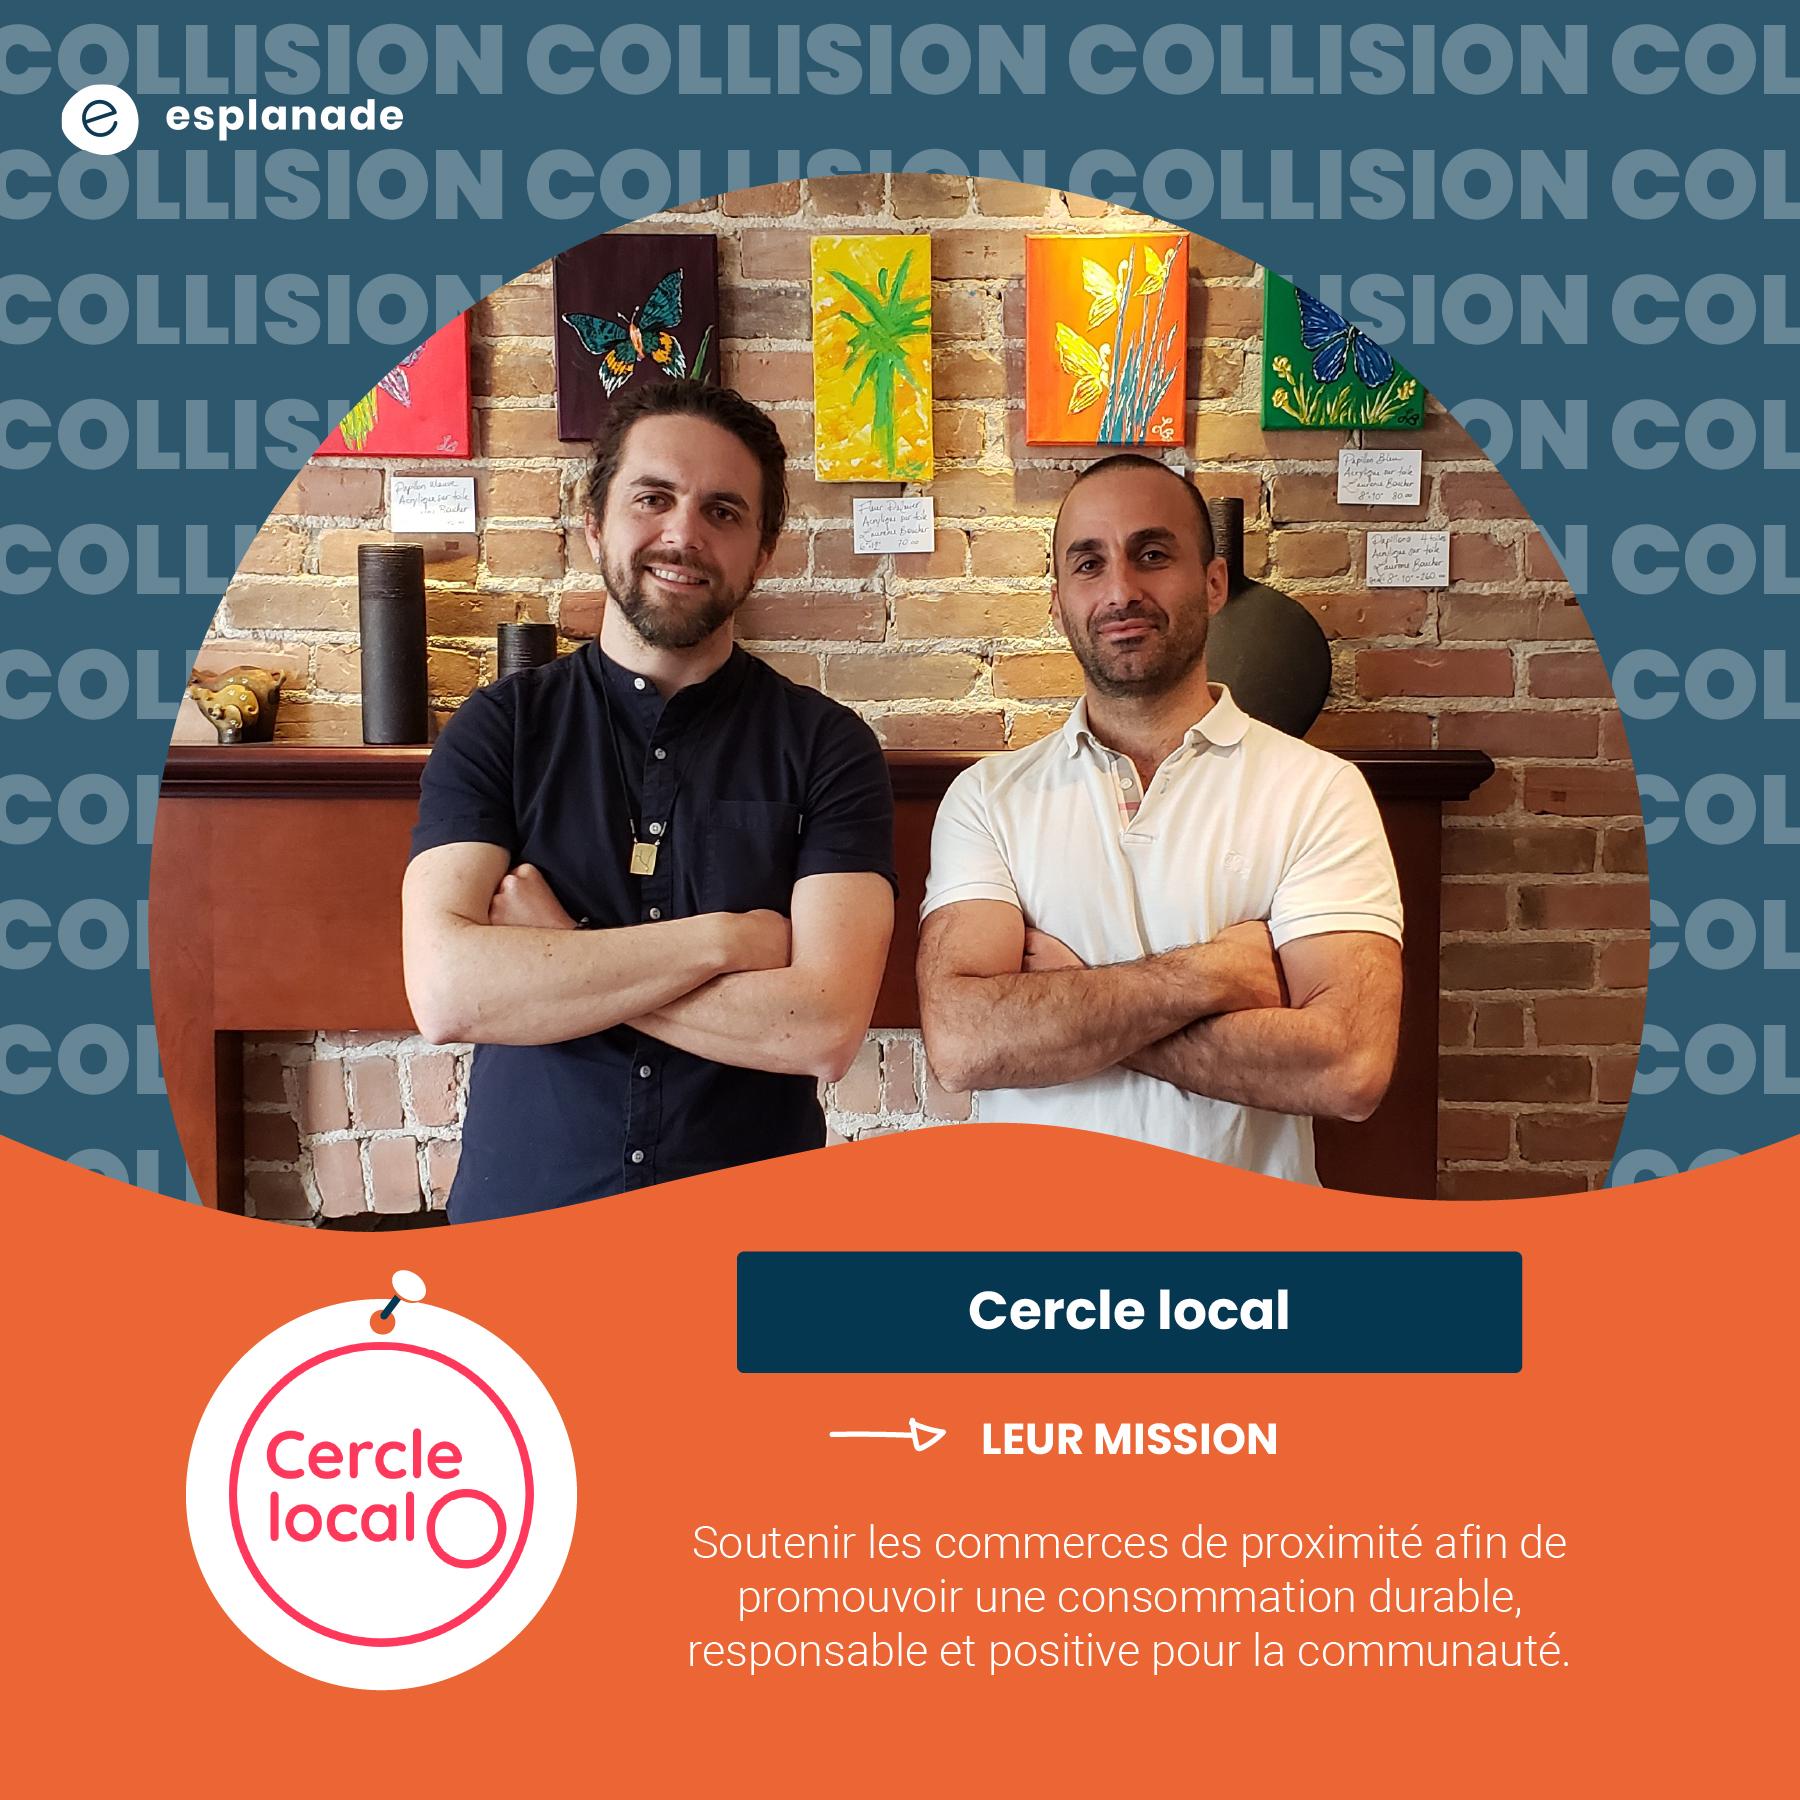 David Habak et Rodrigo Trespalacios de Cercle local